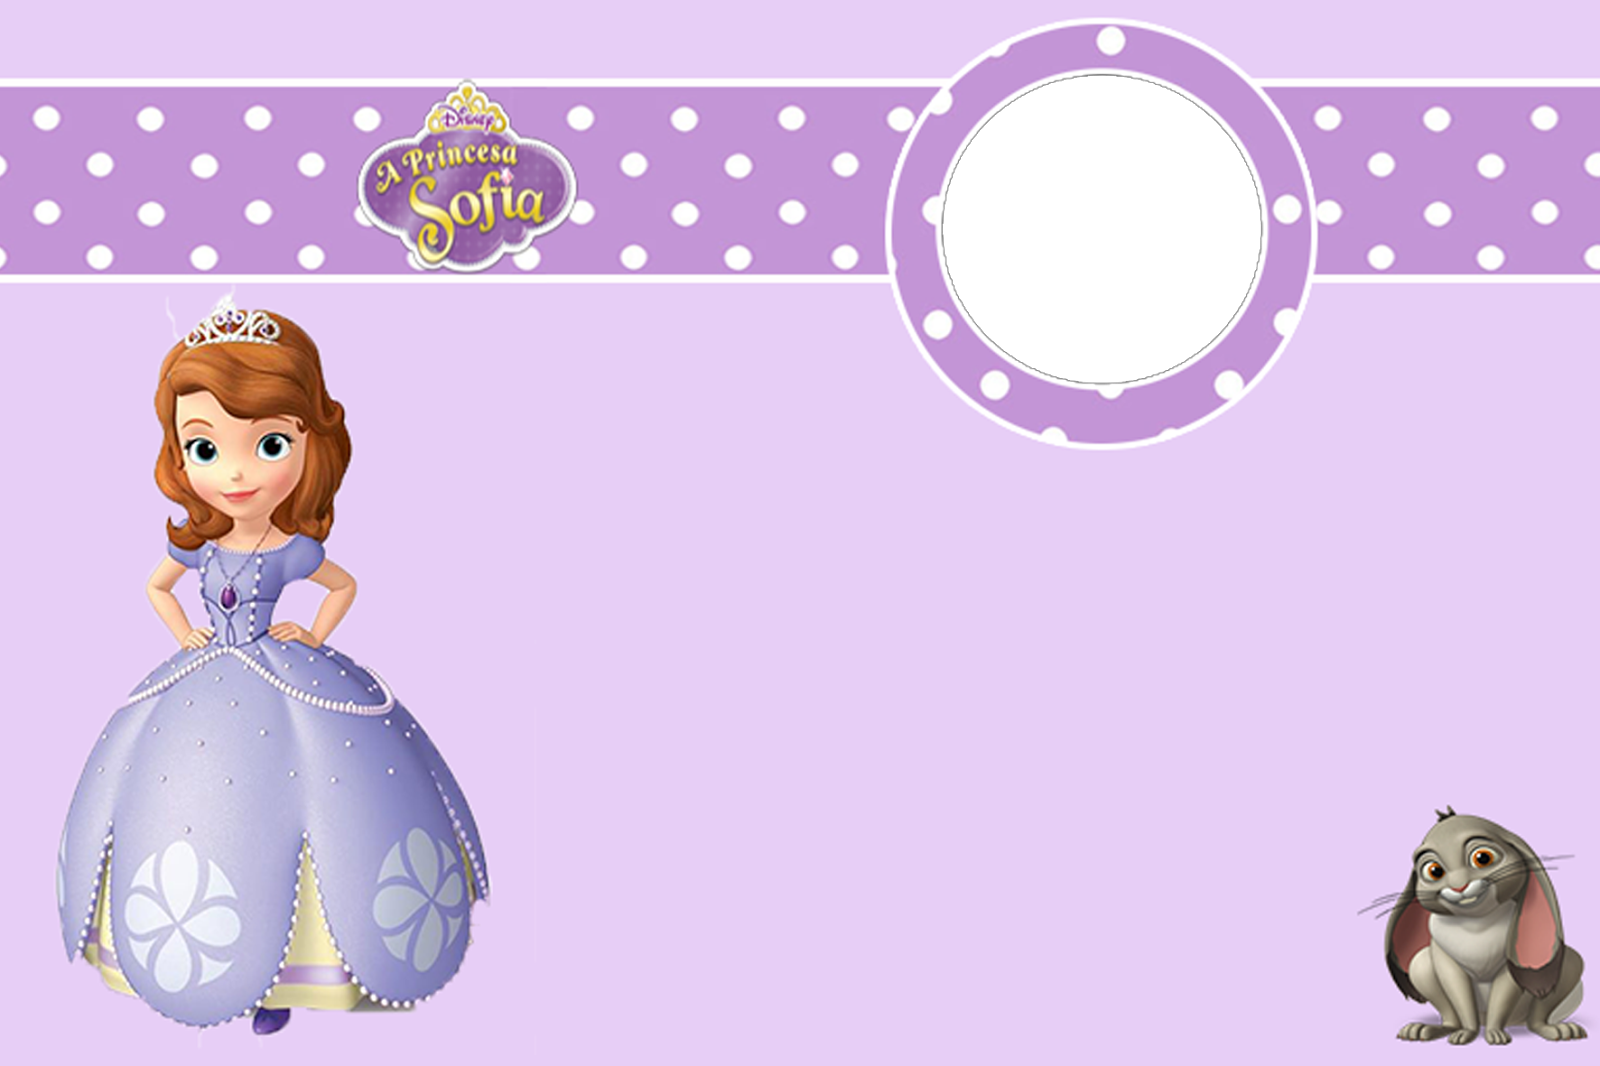 Convite princesa sofia png bunker da foto - Foto princesa sofia ...